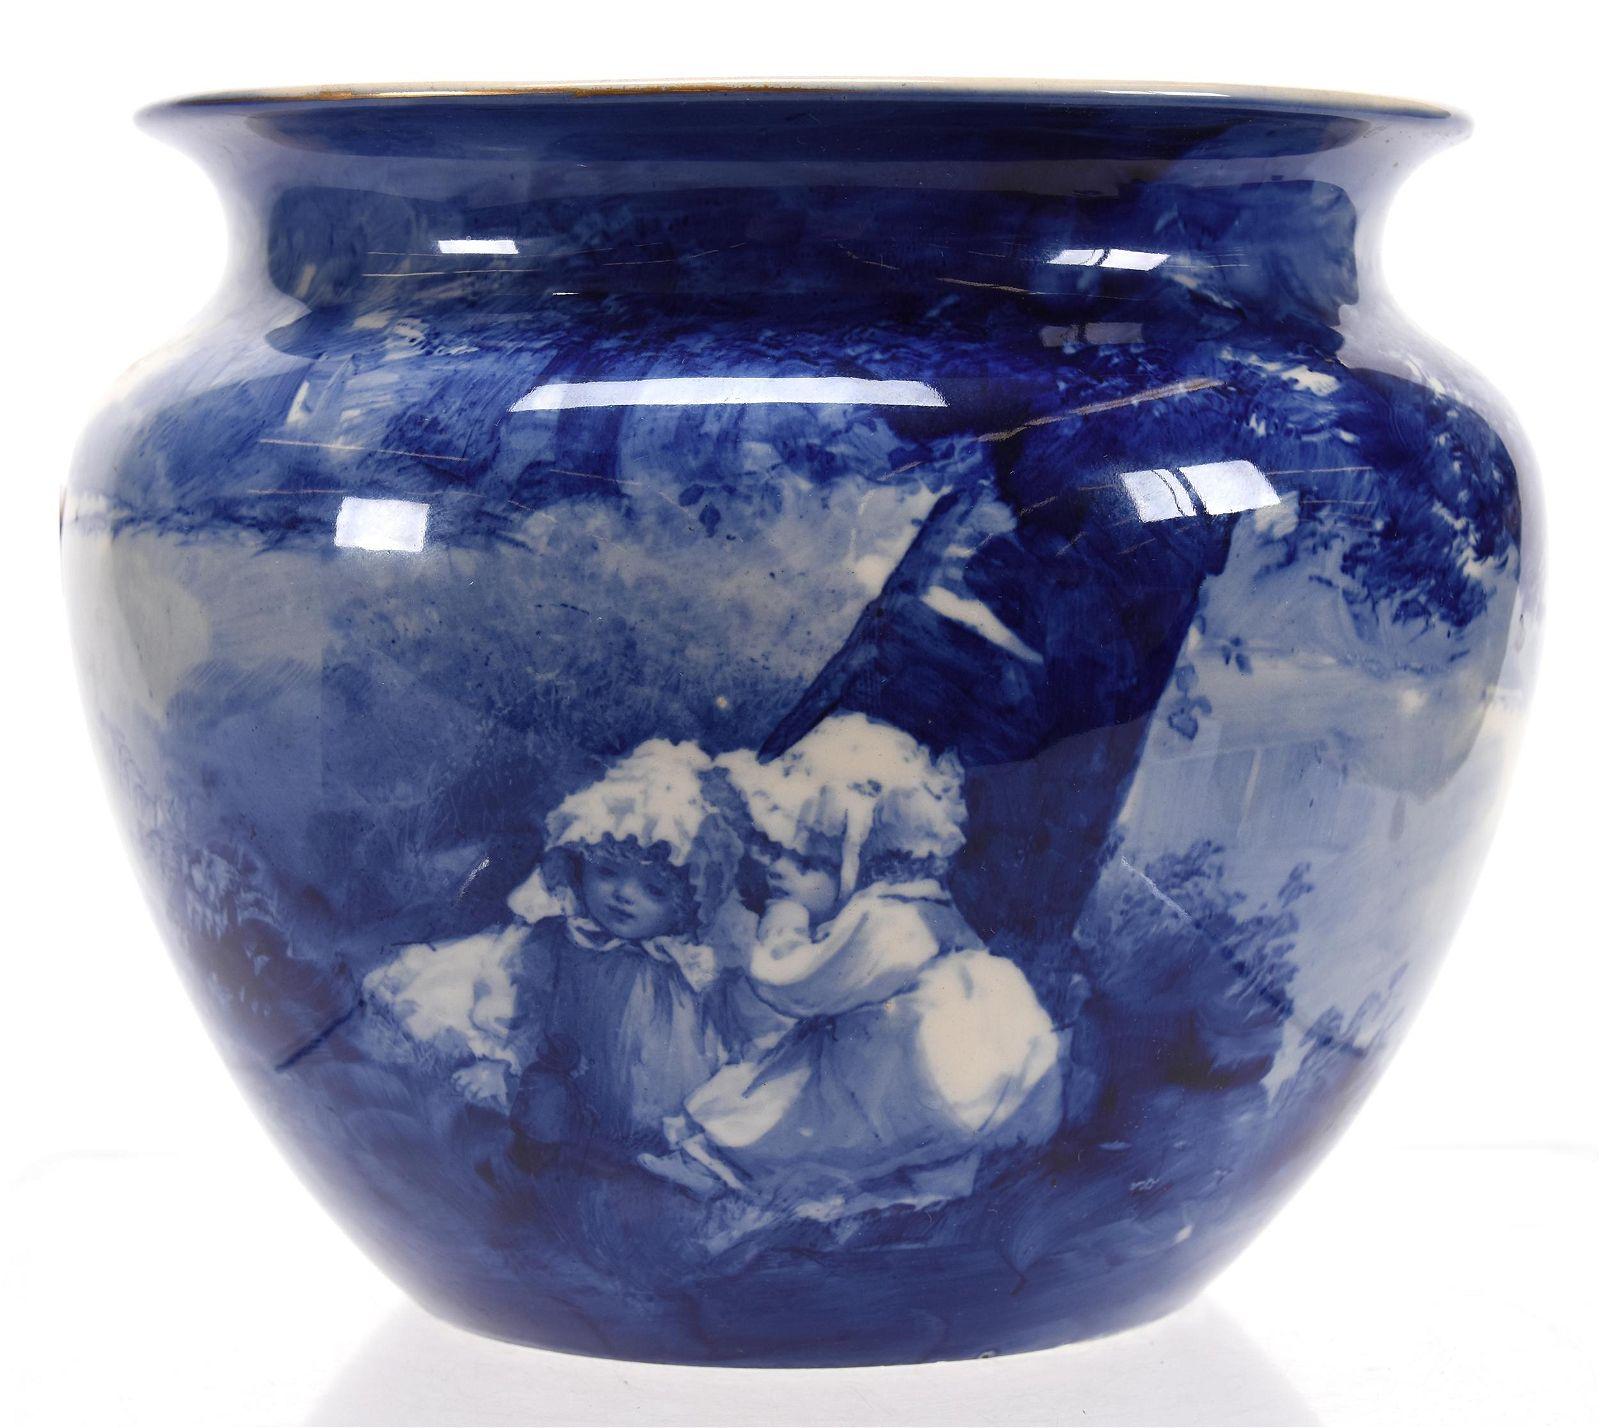 Jardiniere, Marked Royal Doulton, Blue Children